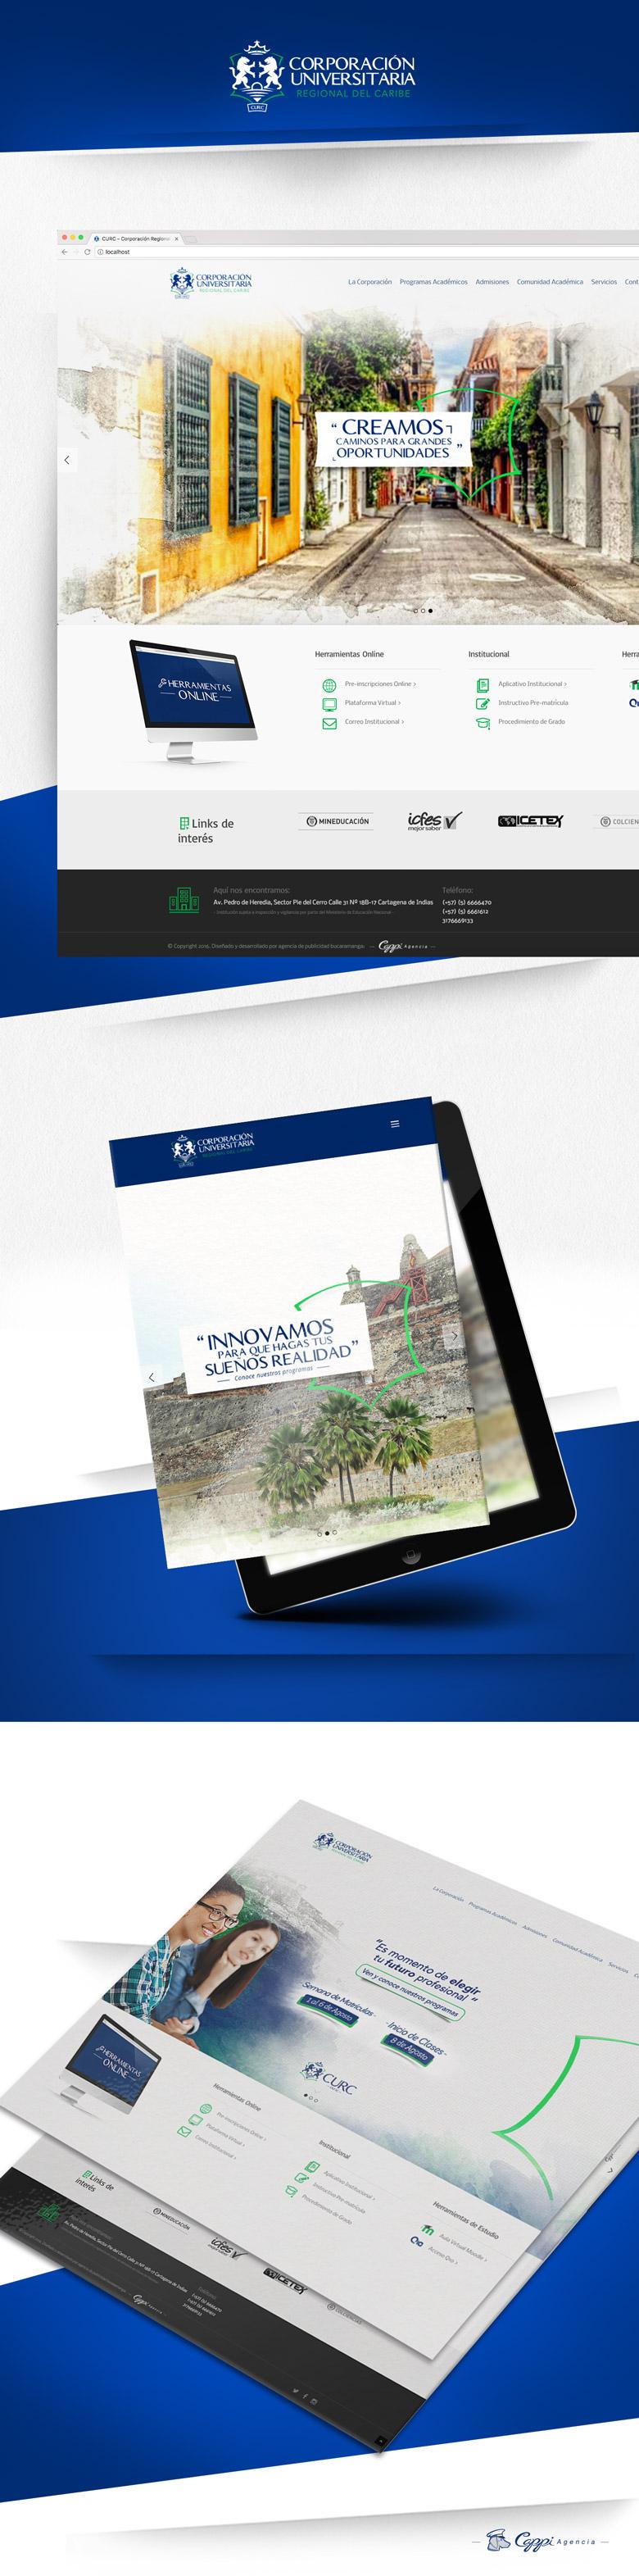 PAGINA-WEB-CURC